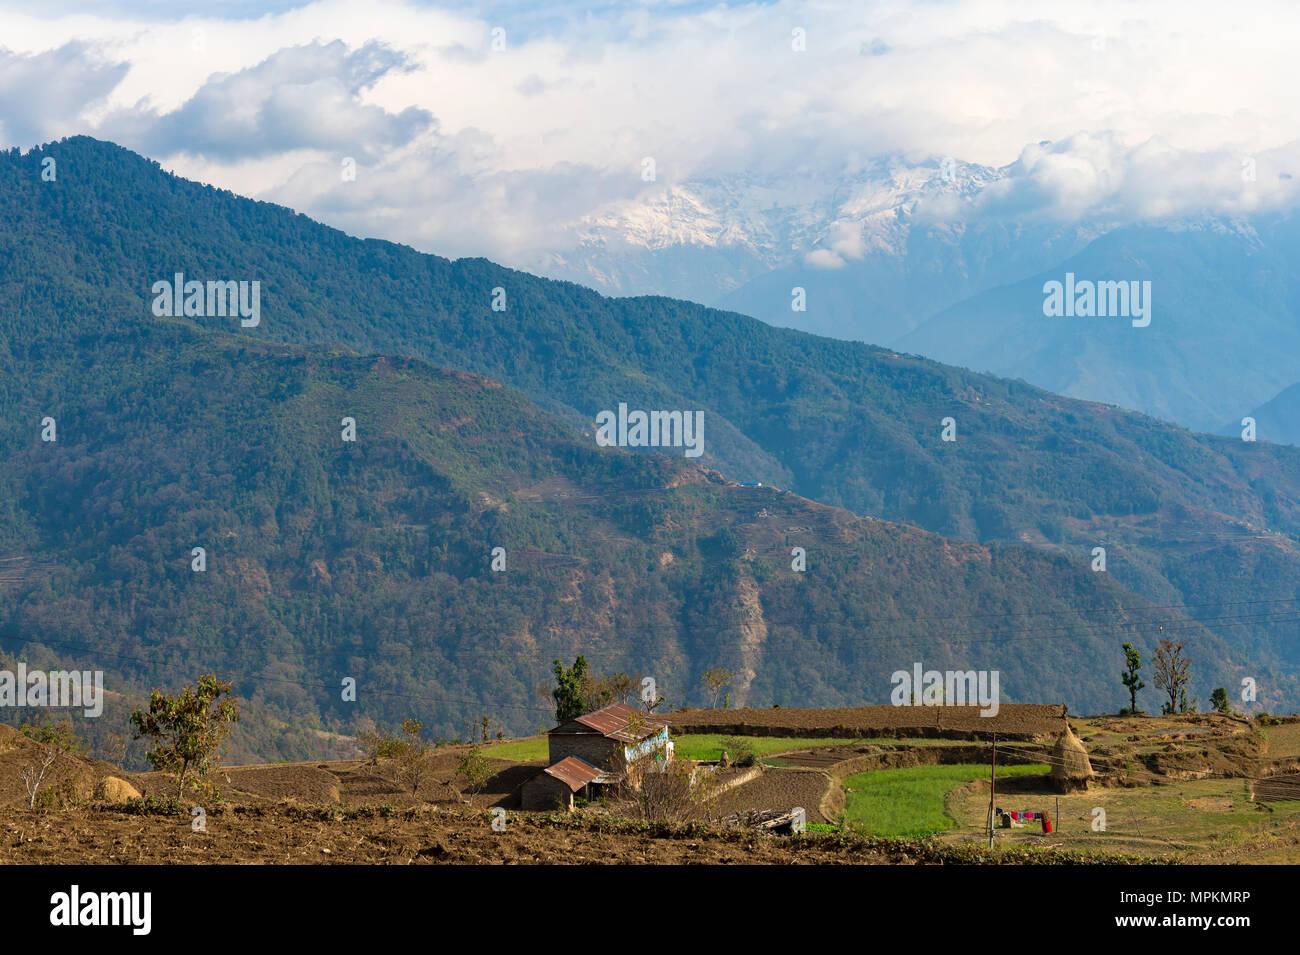 Himalaya range viewed from the Dhampus Mountain village, Nepal - Stock Image